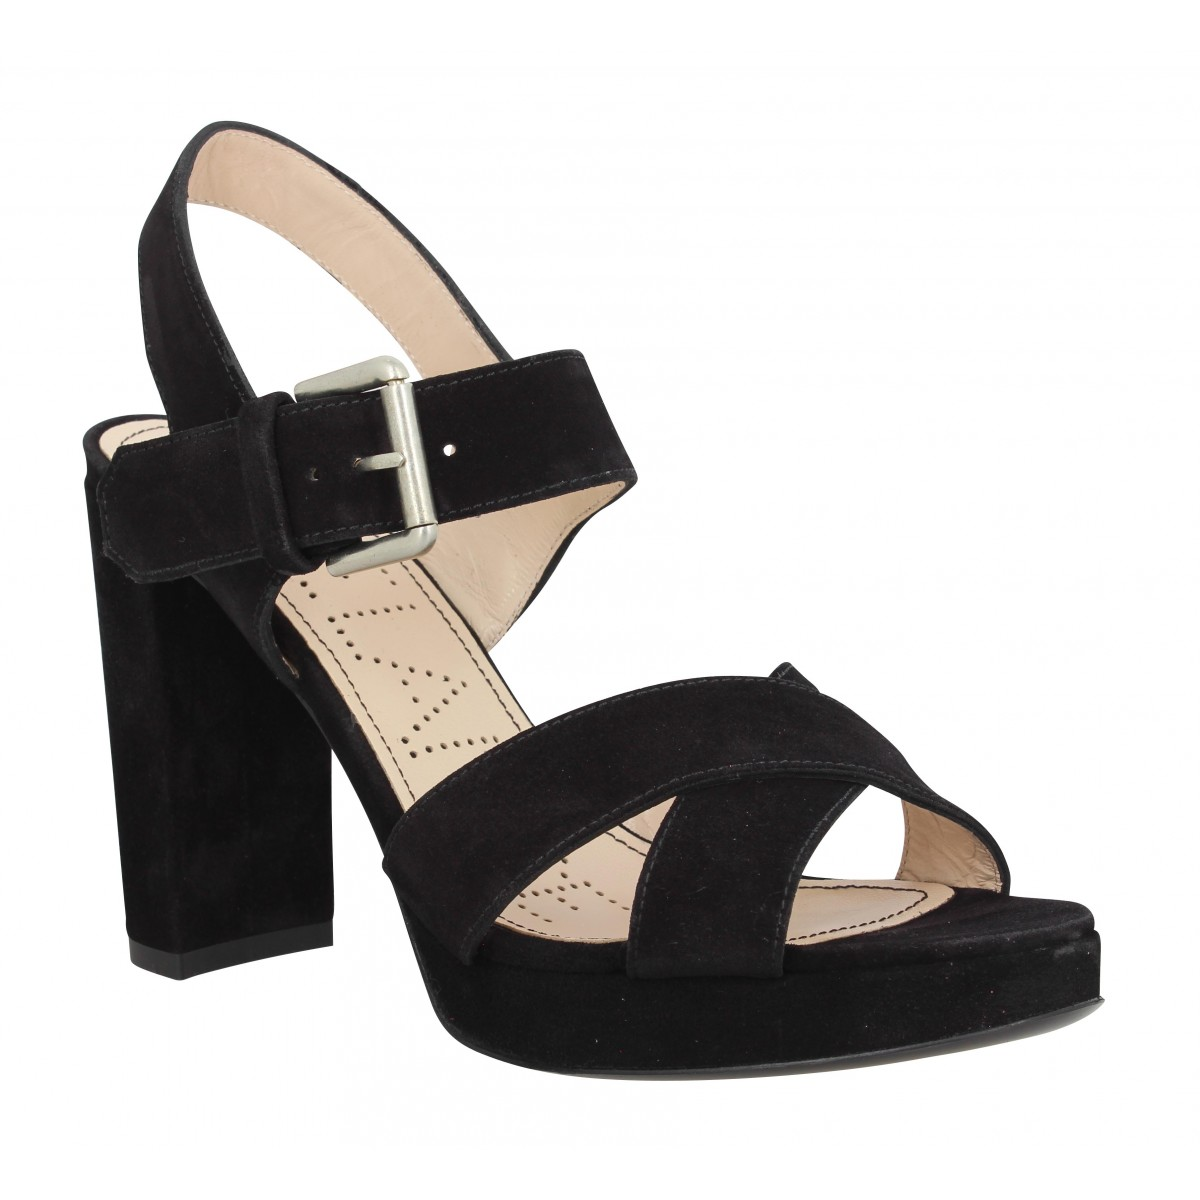 Elisa FREE Noir LANCE velours Cross Sandal 7 Femme iPXZku